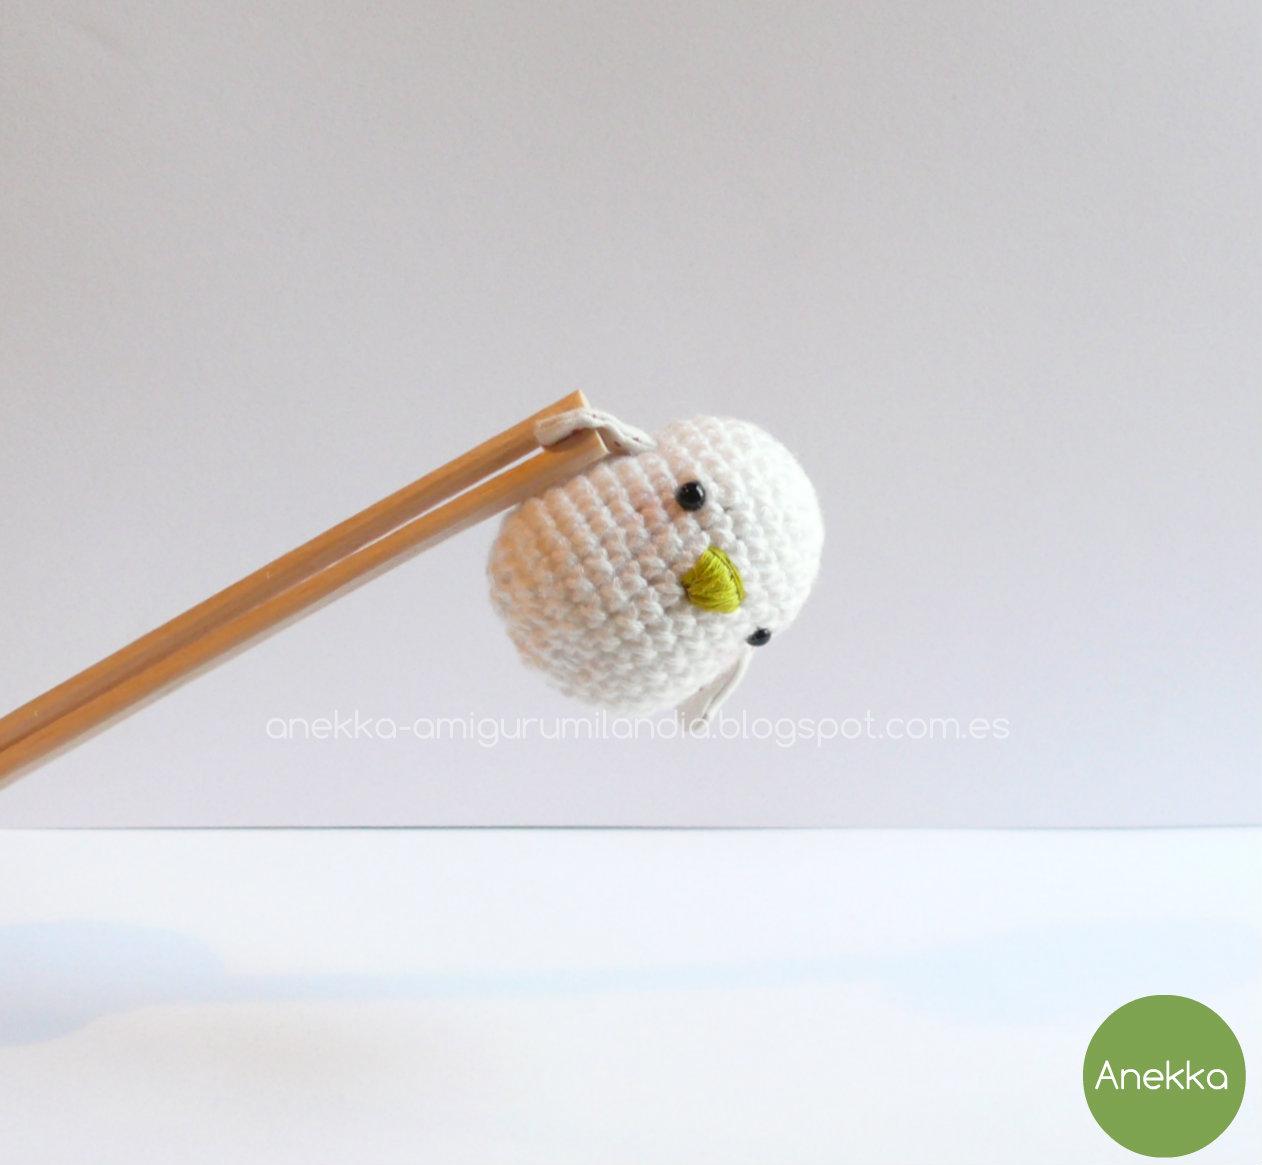 pollito anekka handmade